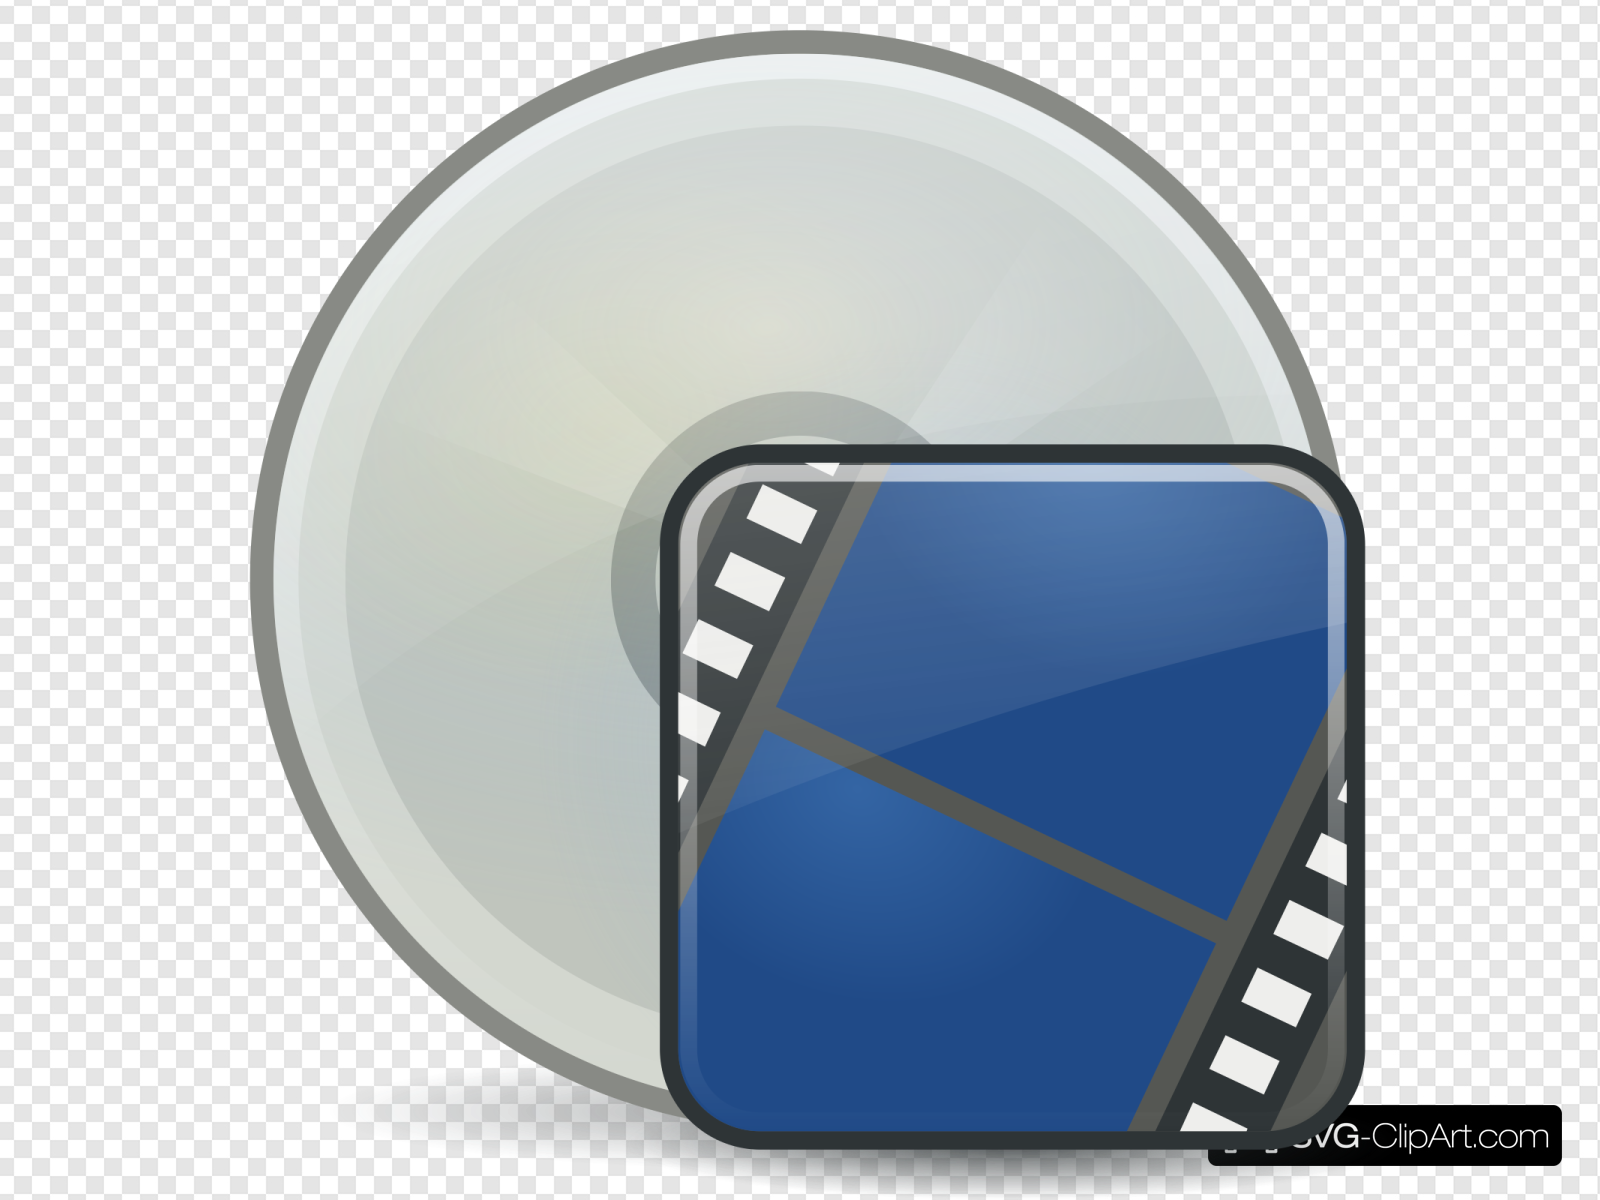 Burn clip art icon. Cd clipart movie